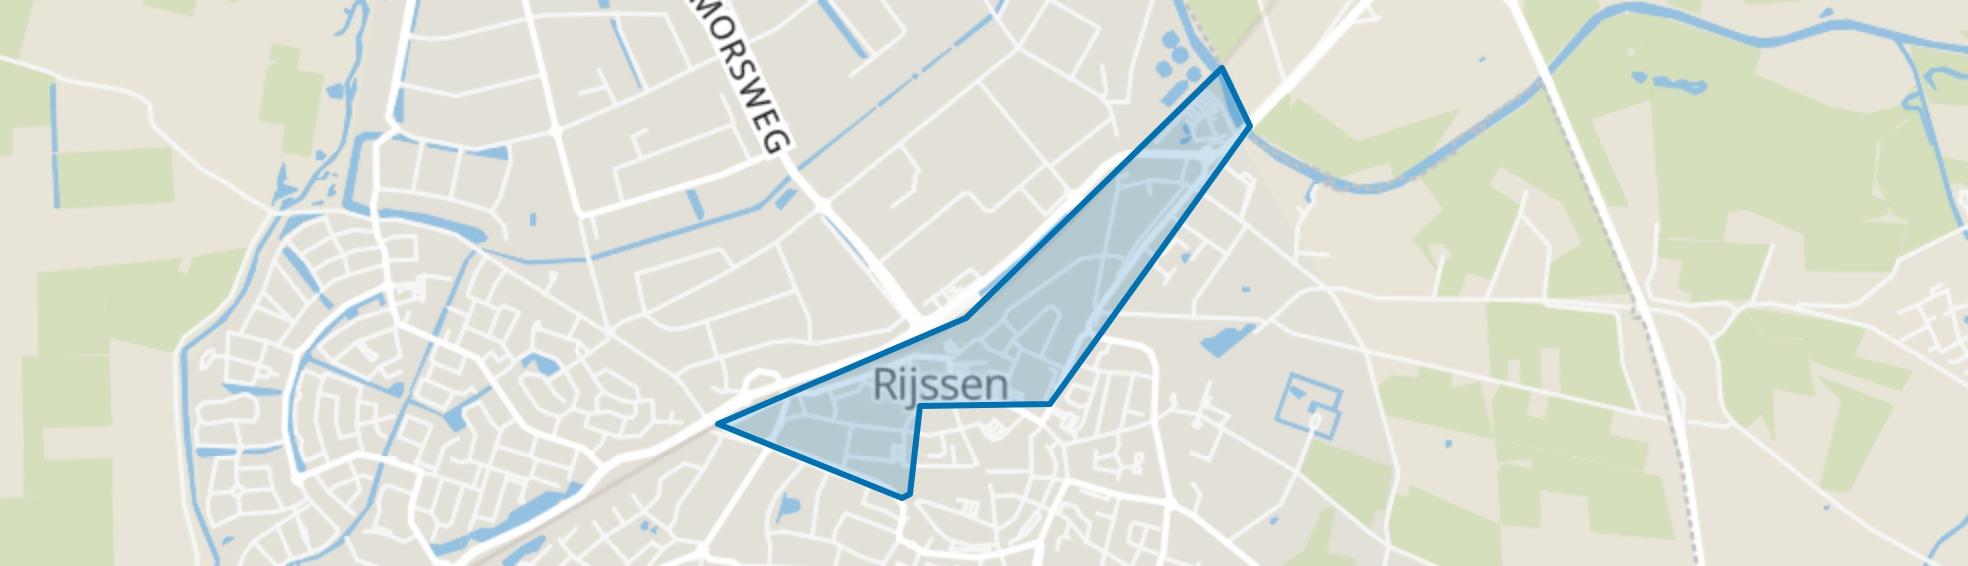 Kern rand Noord, Rijssen map